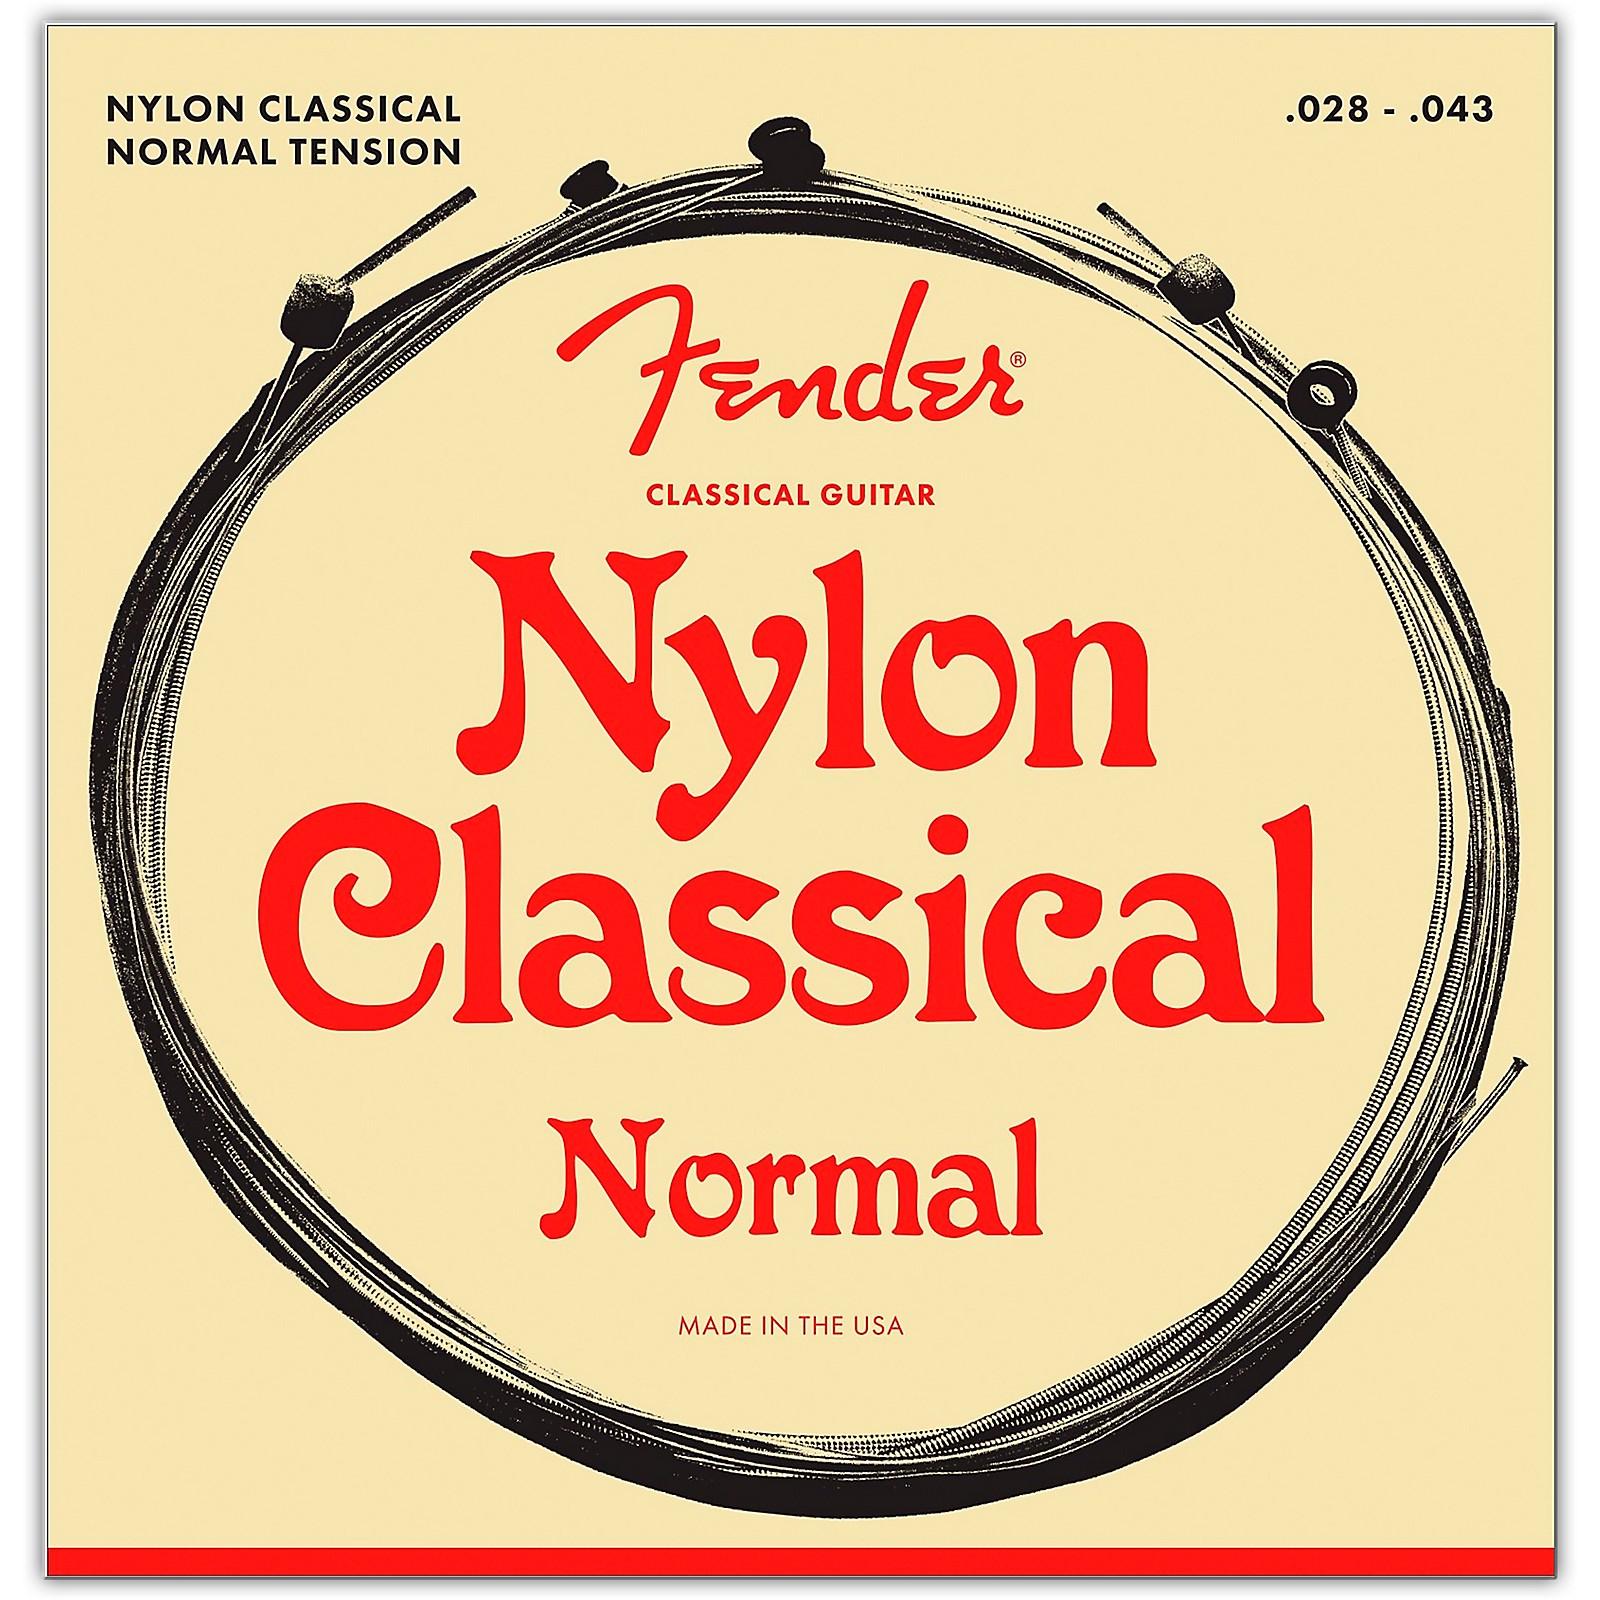 Fender 130 Clear/Silver Classical Nylon Guitar Strings - Ball End